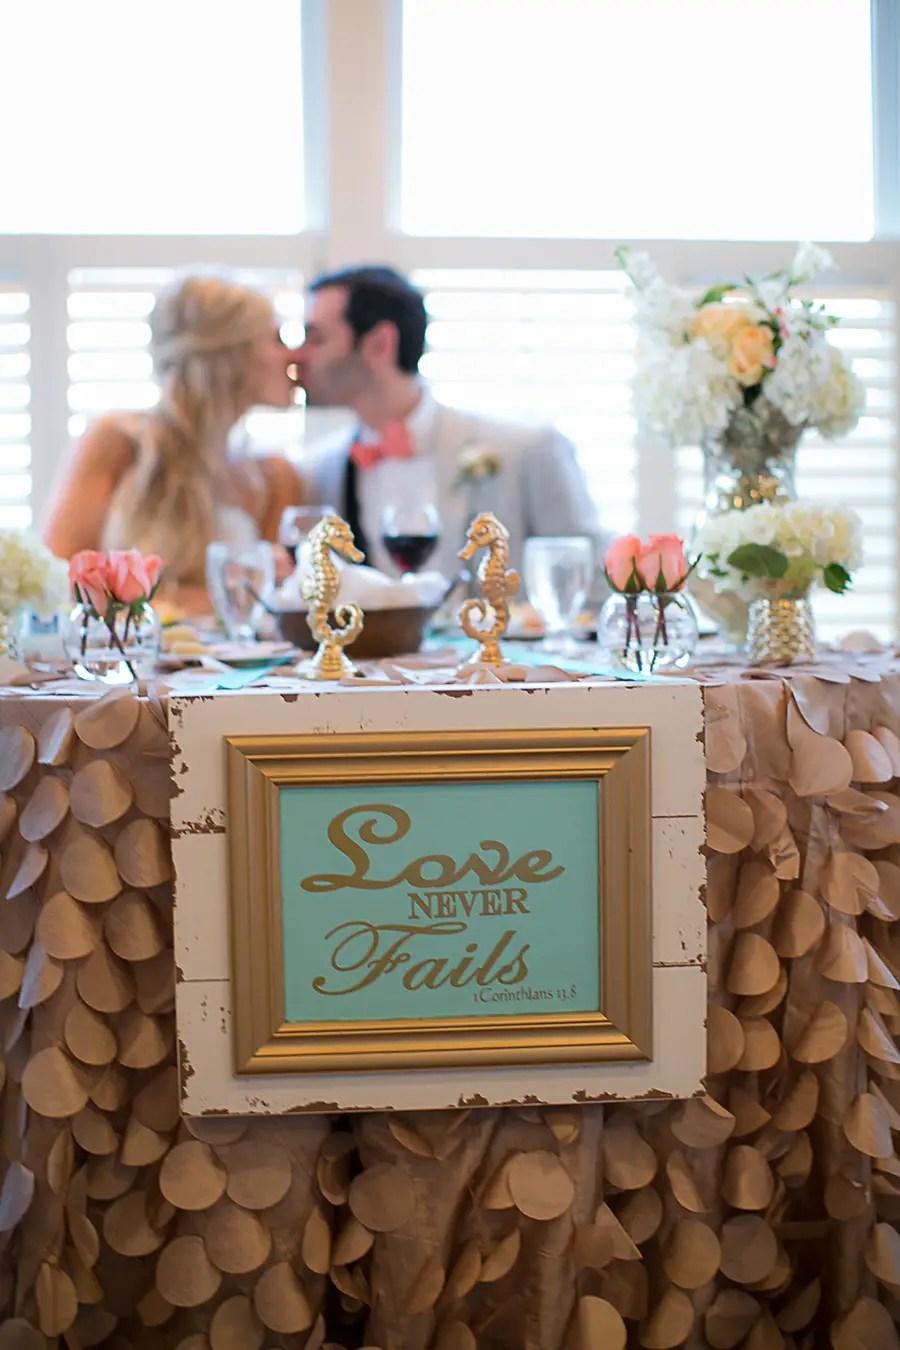 The Bride and Groom - Head Table - Bald Head Island Wedding - Photo by Eric Boneske